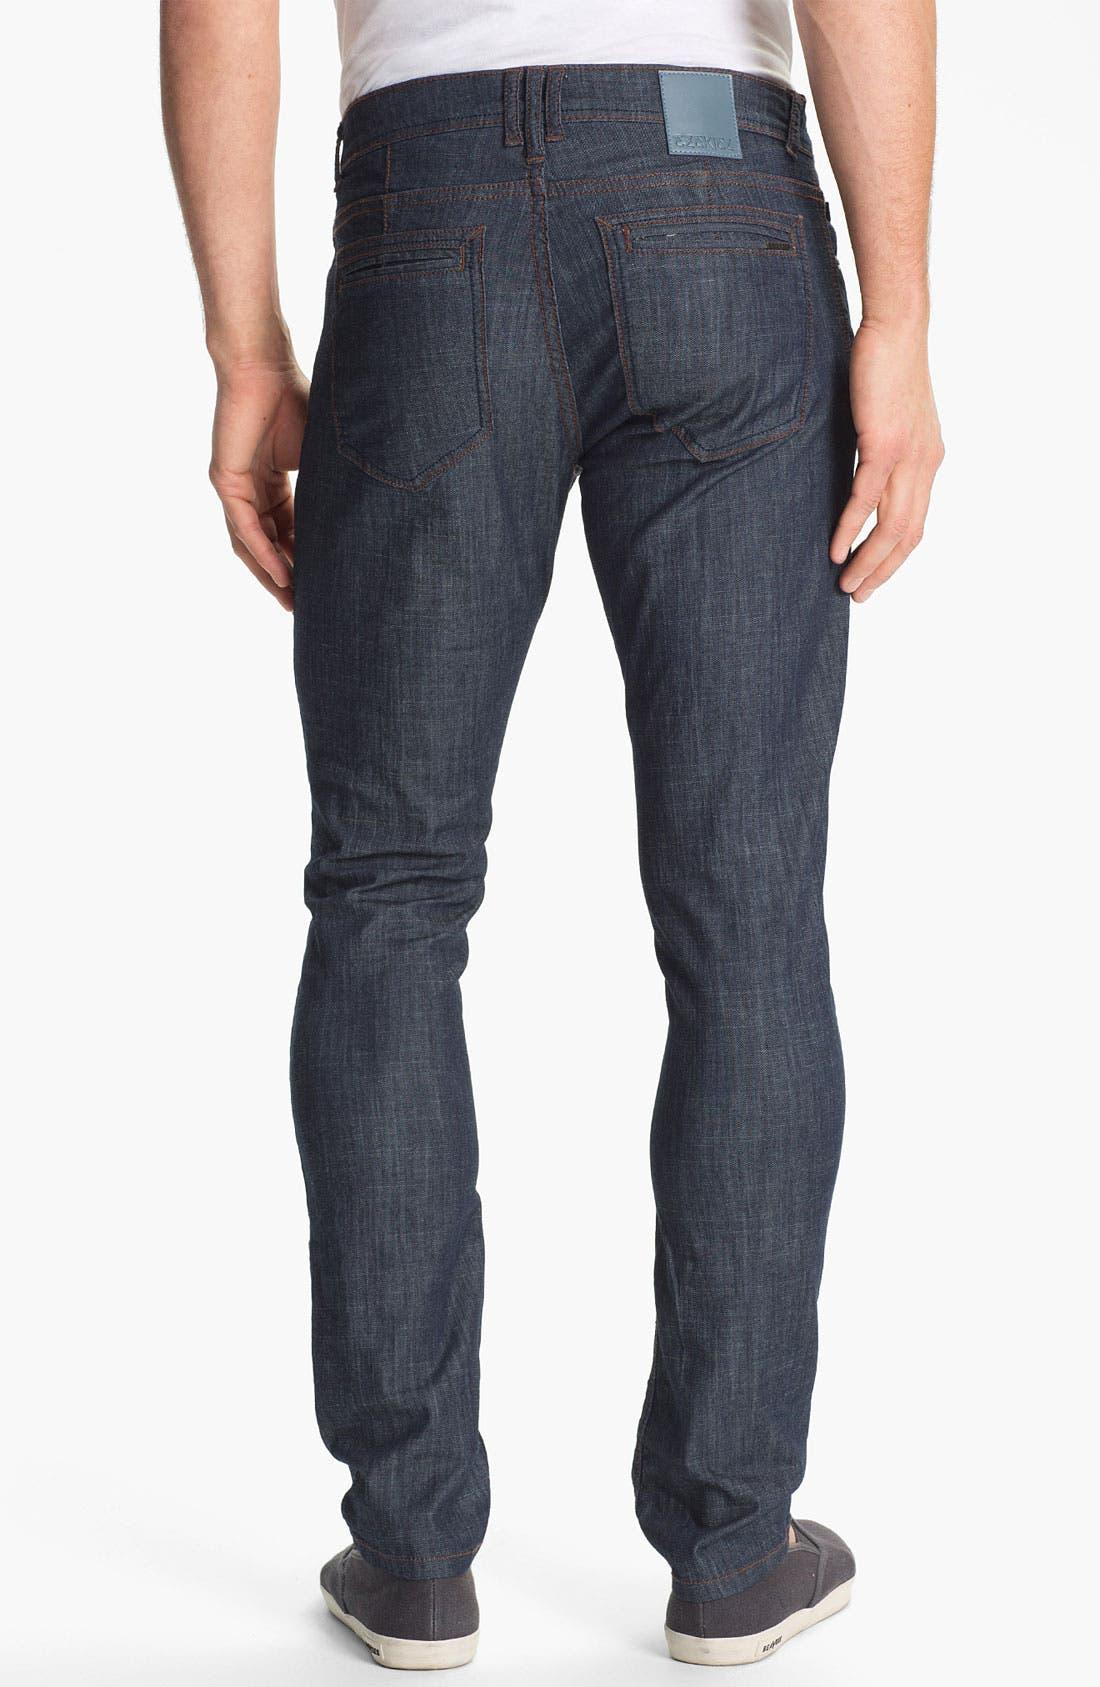 Alternate Image 1 Selected - Ezekiel 'Chopper' Slim Straight Leg Jeans (Dark Indigo)